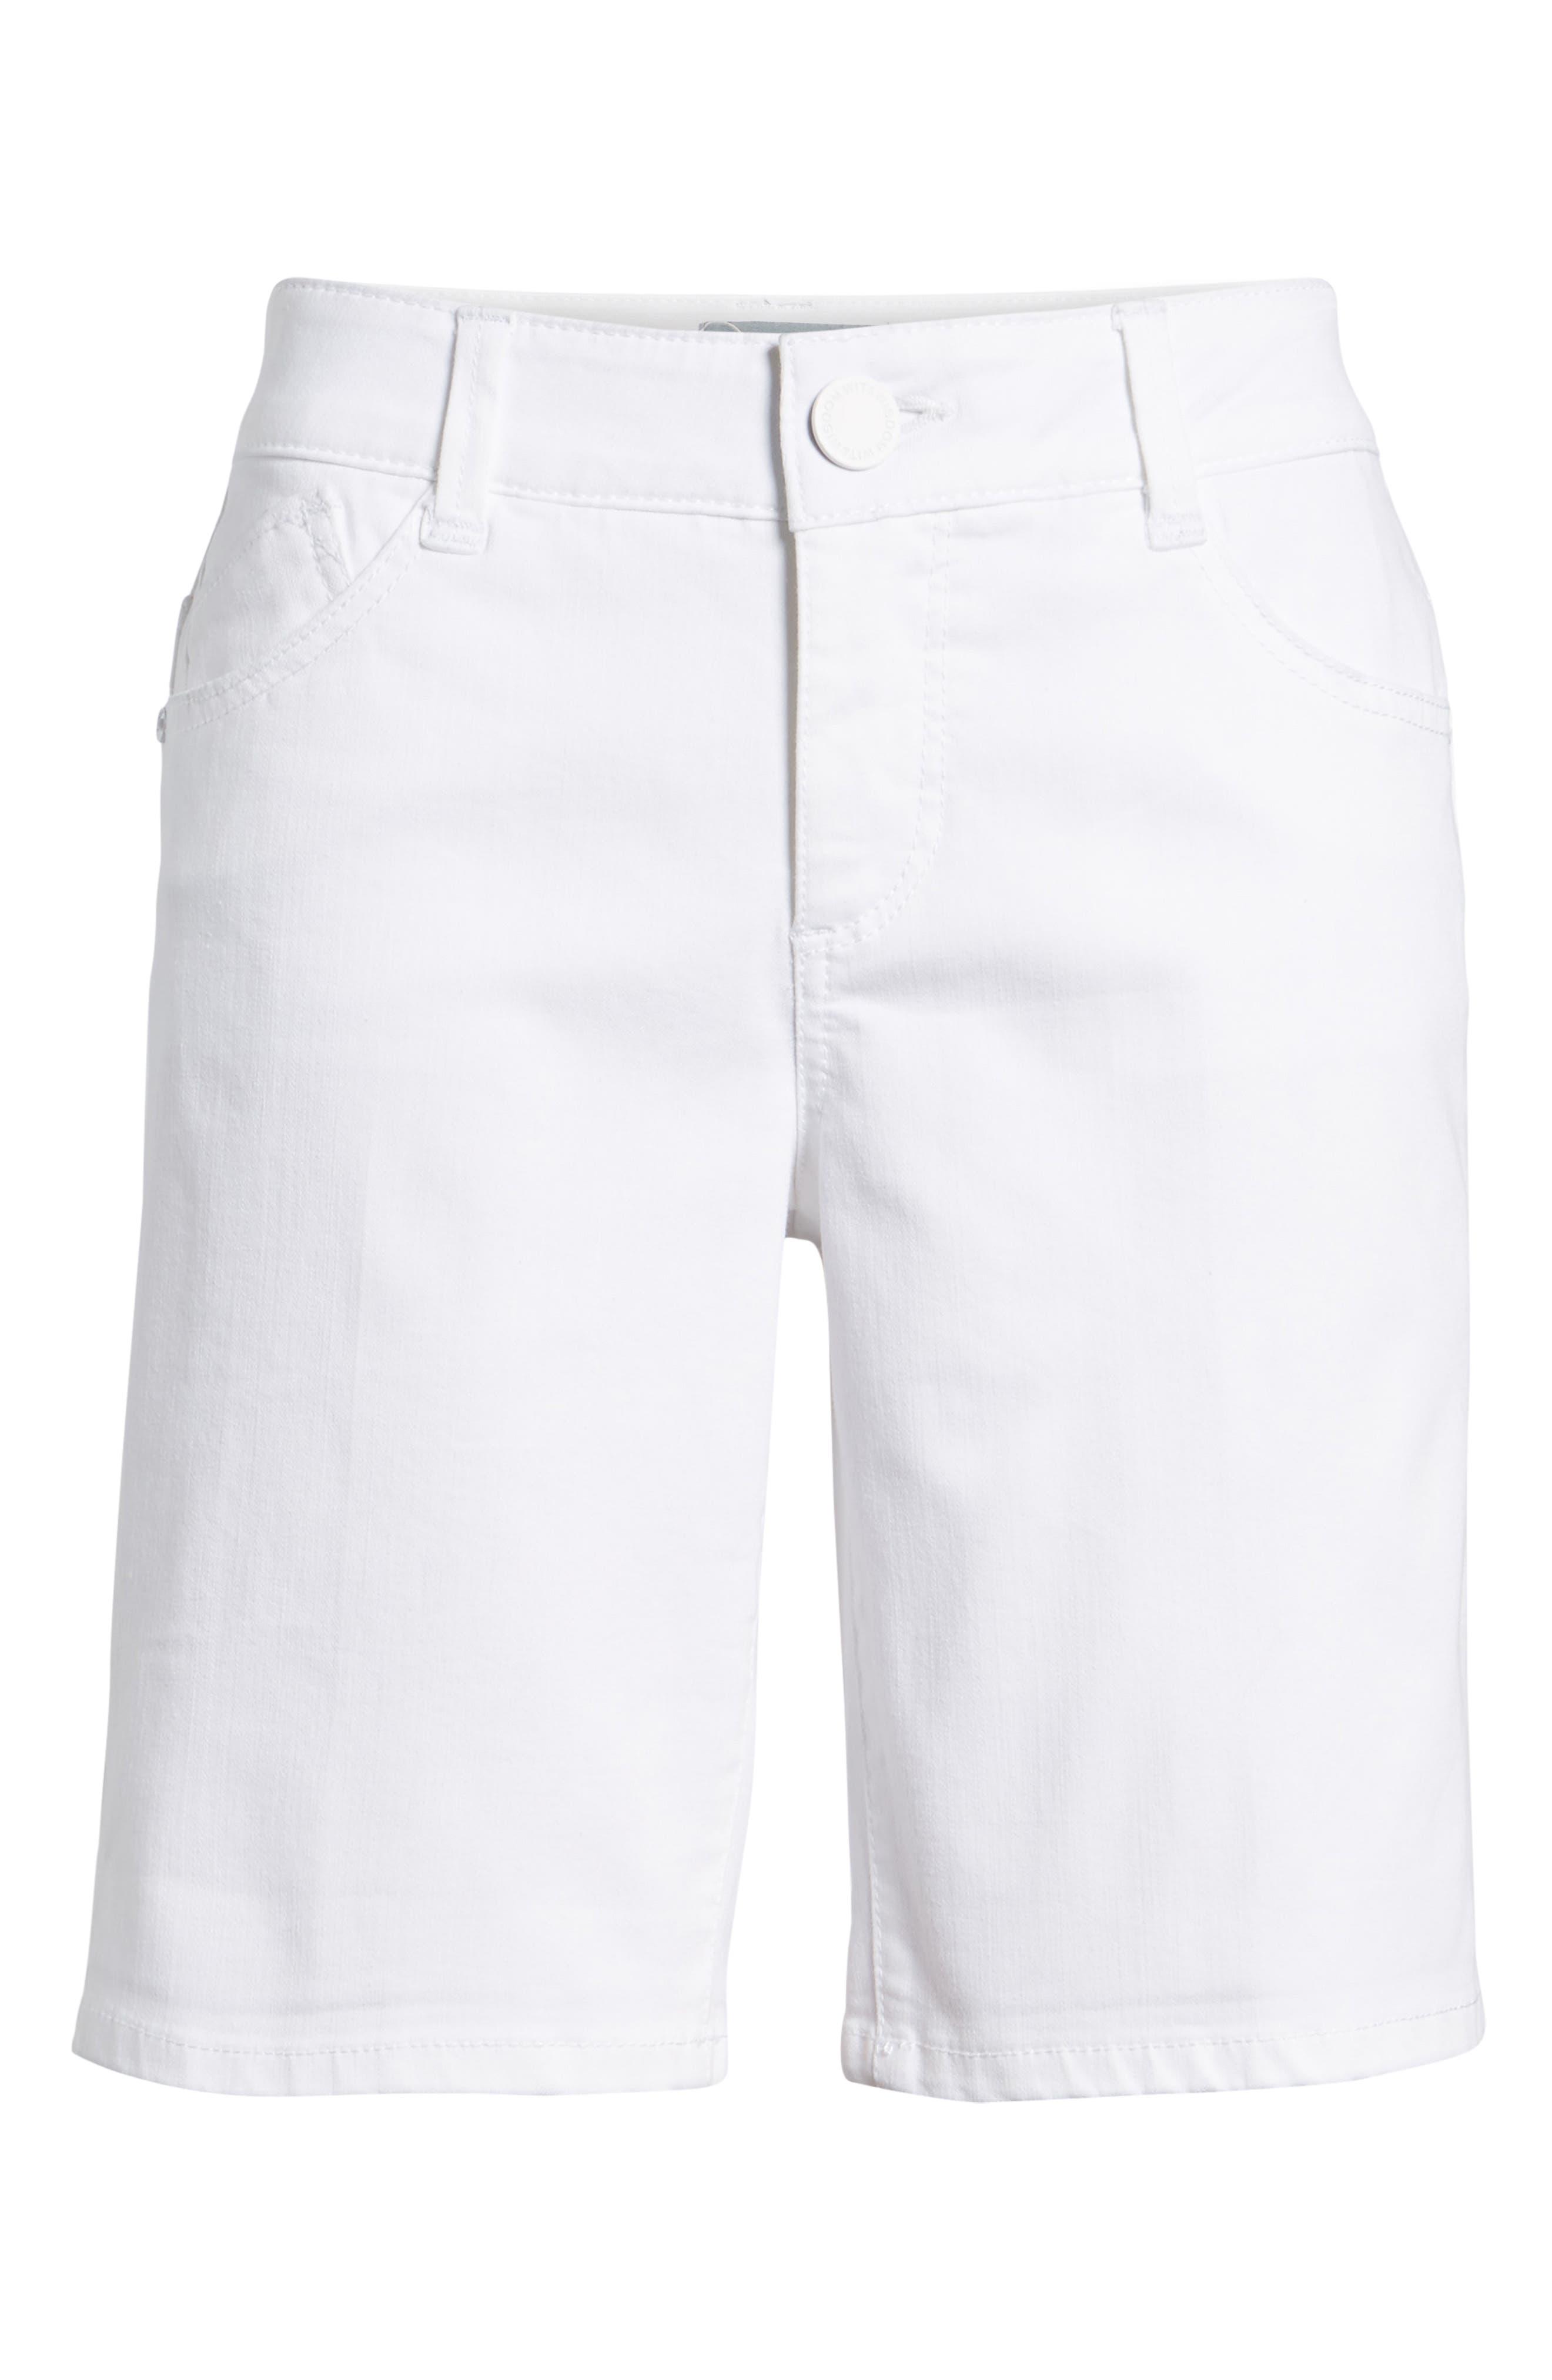 WIT & WISDOM, Ab-Solution White Denim Shorts, Alternate thumbnail 7, color, OPTIC WHITE